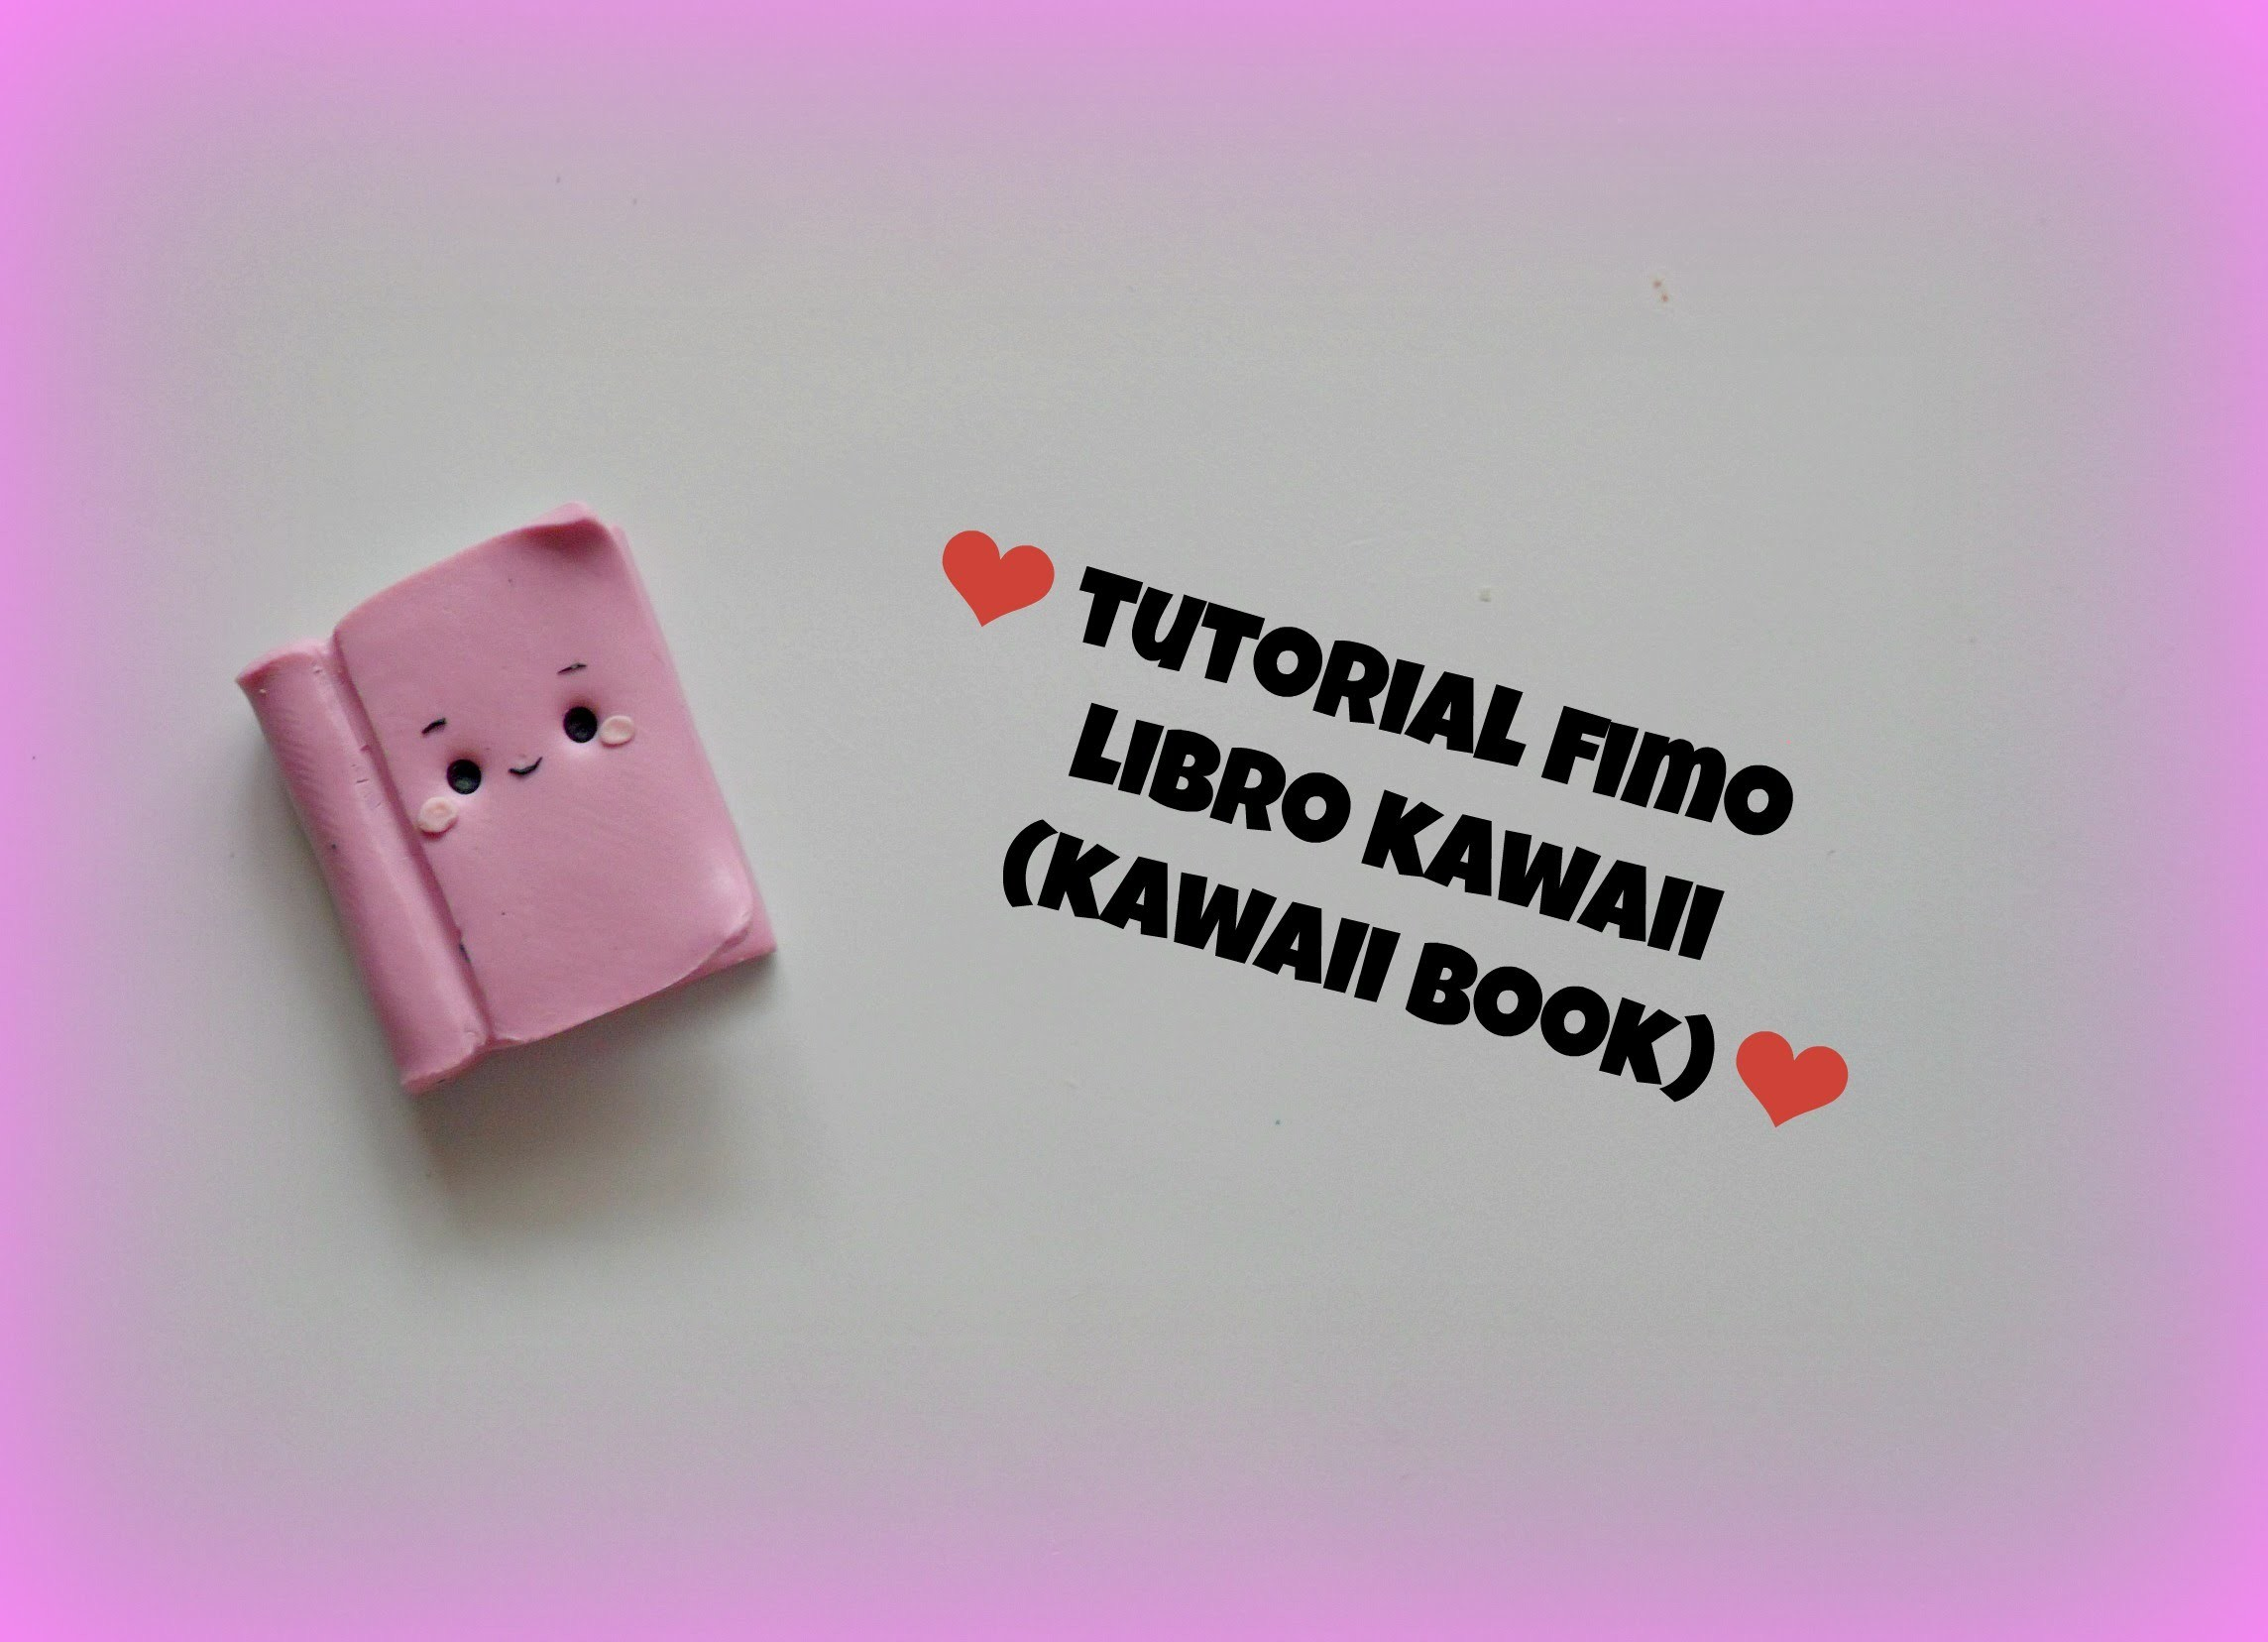 TUTORIAL FIMO LIBRO KAWAII (polymer clay kawaii book)